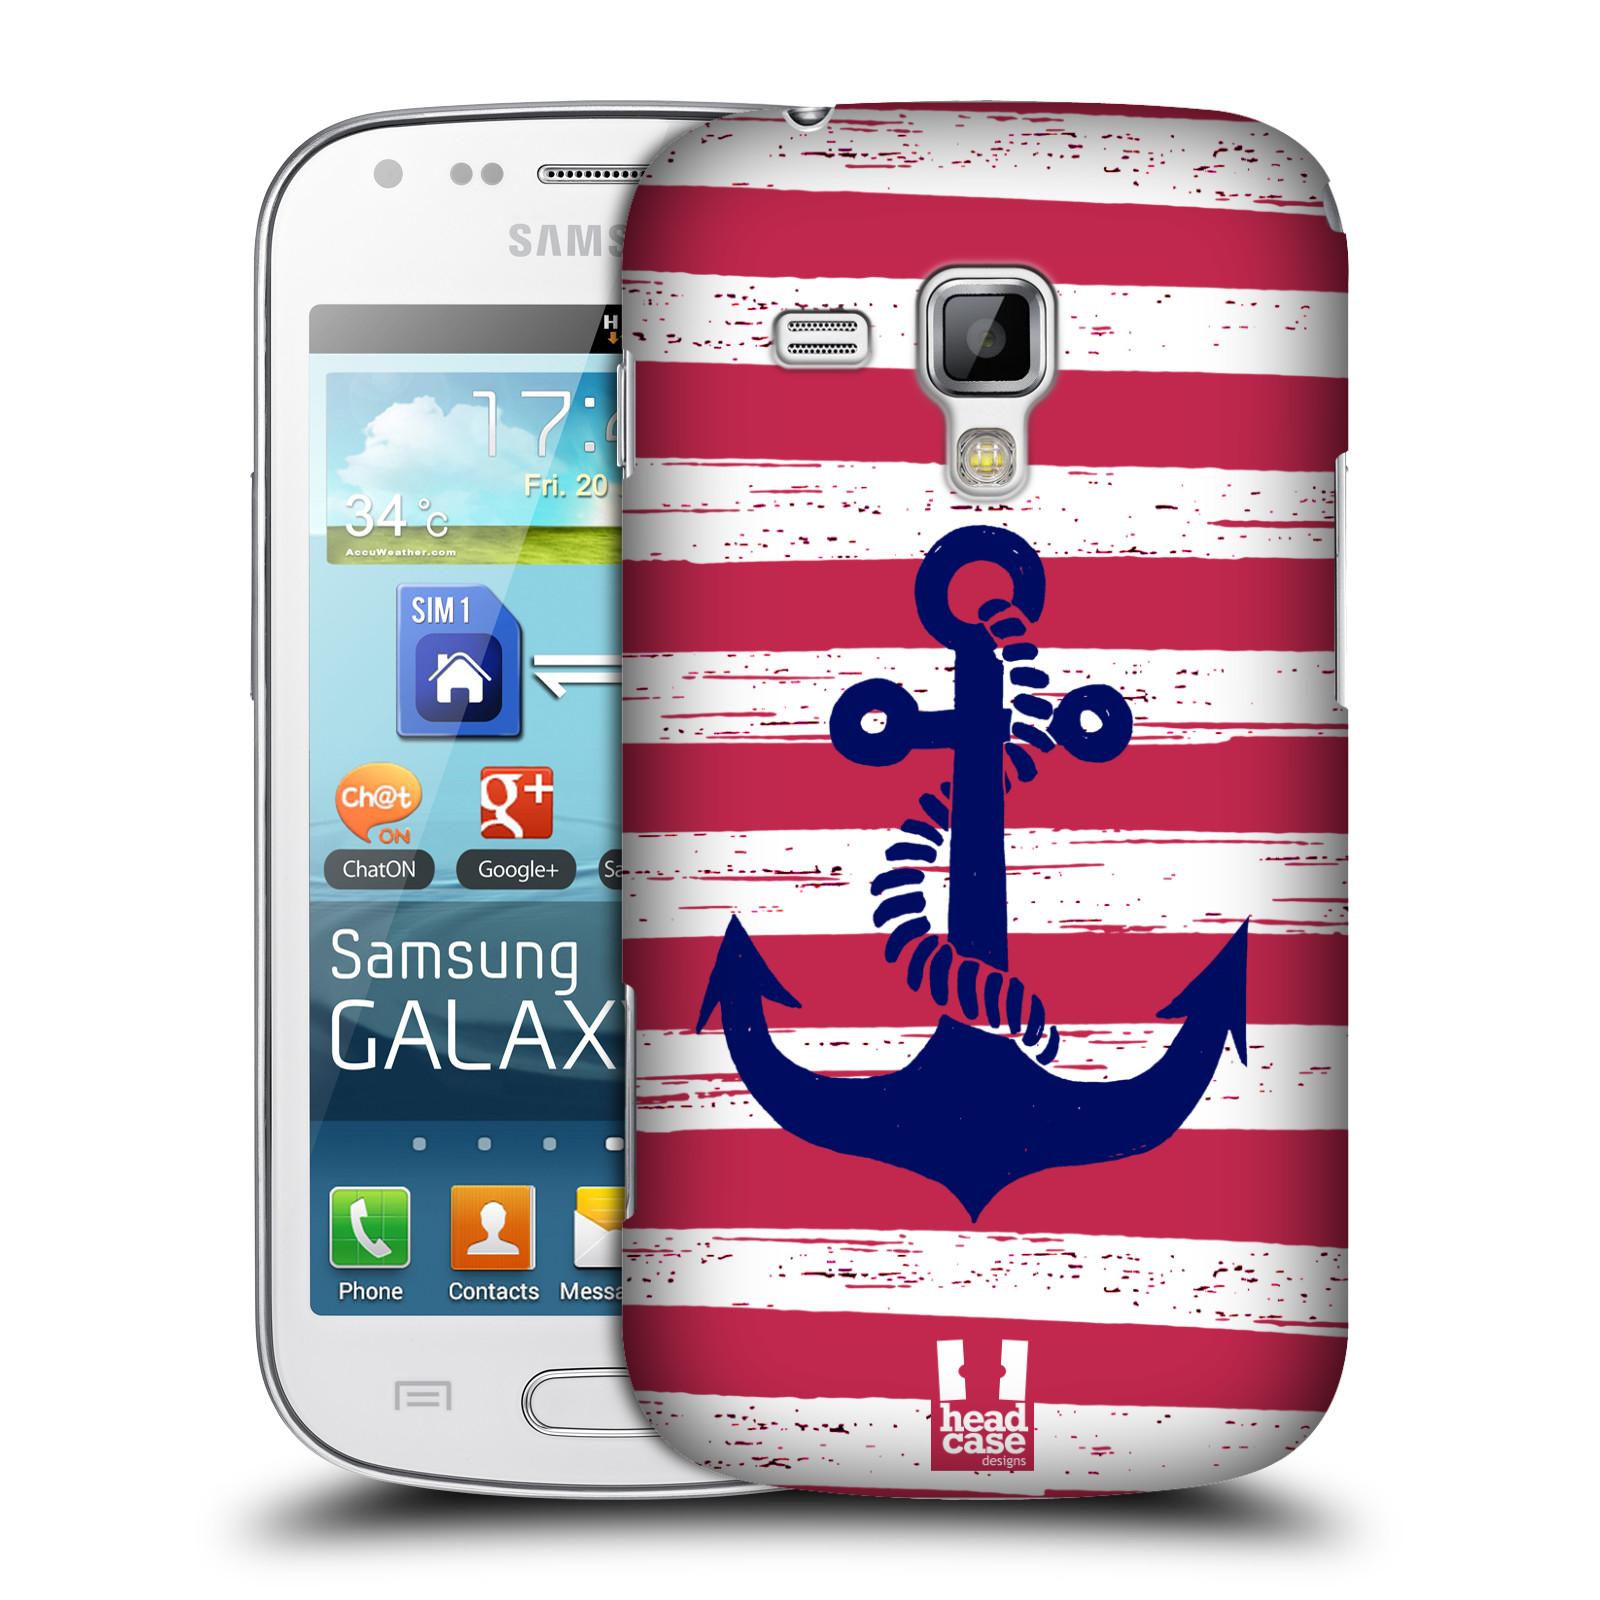 Plastové pouzdro na mobil Samsung Galaxy S Duos HEAD CASE KOTVA S PRUHY (Kryt či obal na mobilní telefon Samsung Galaxy S Duos GT-S7562)